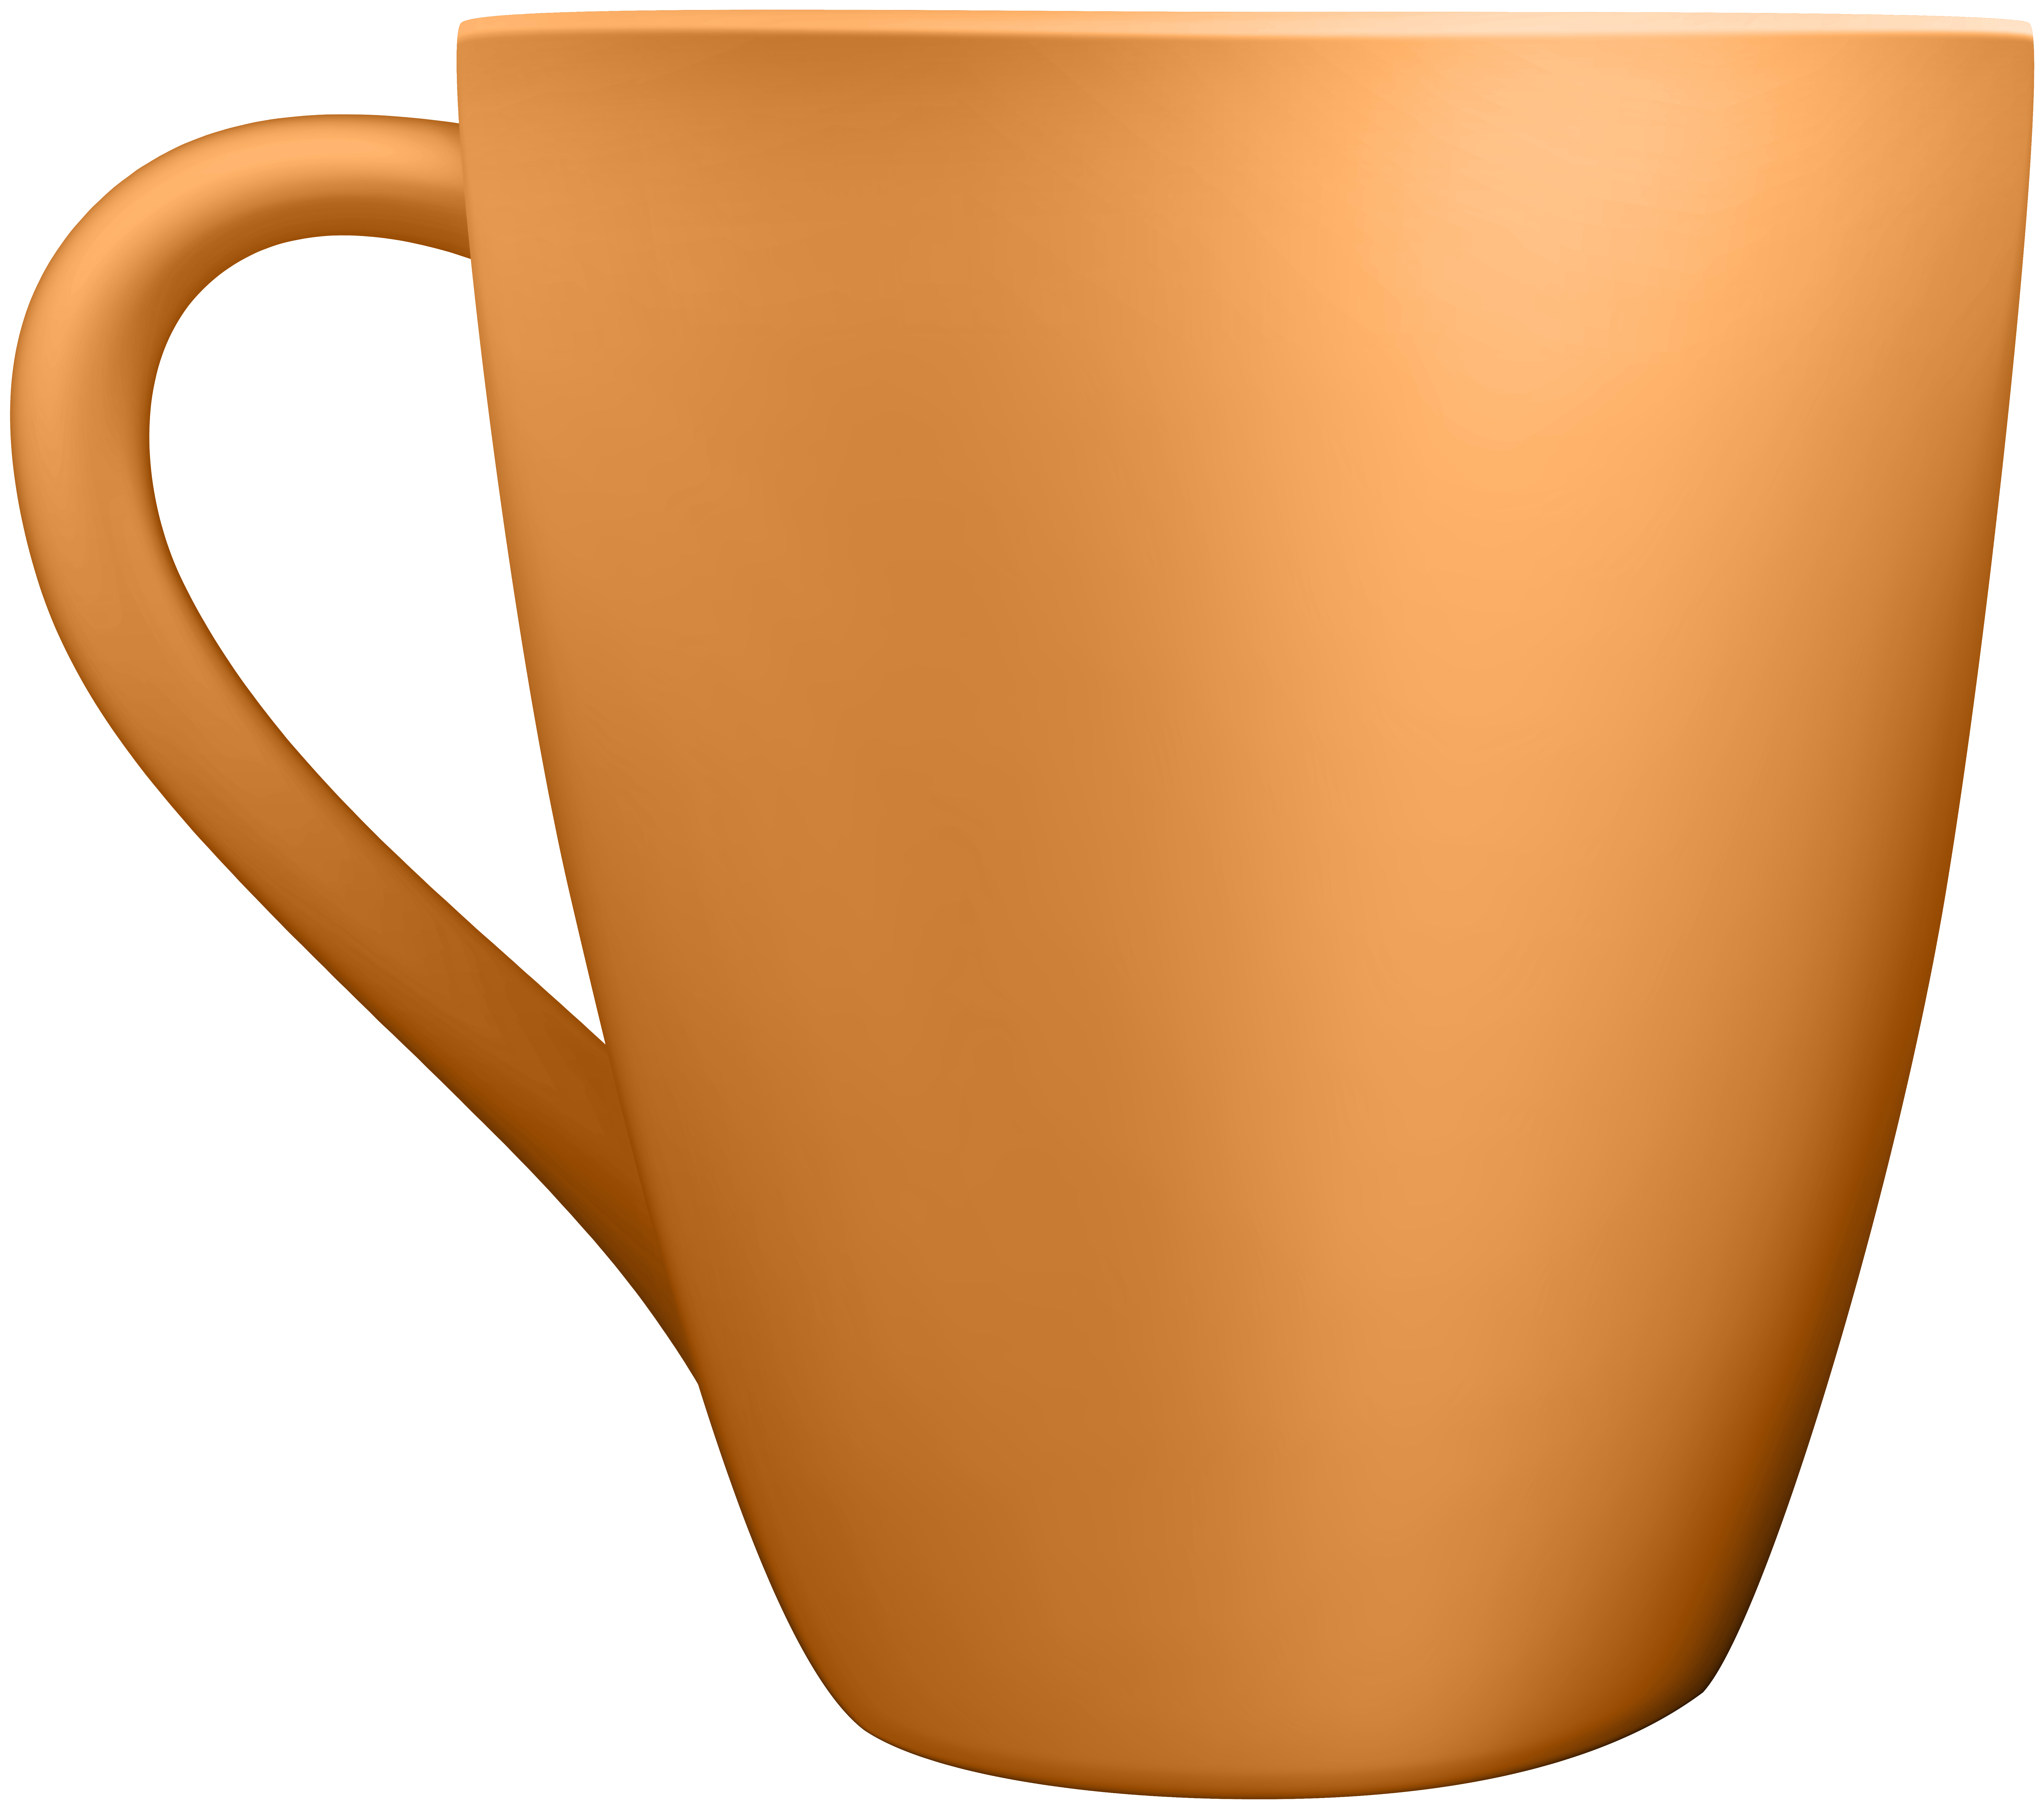 Mug clipart banner Orange Ceramic Mug Clip Art - Best WEB Clipart banner